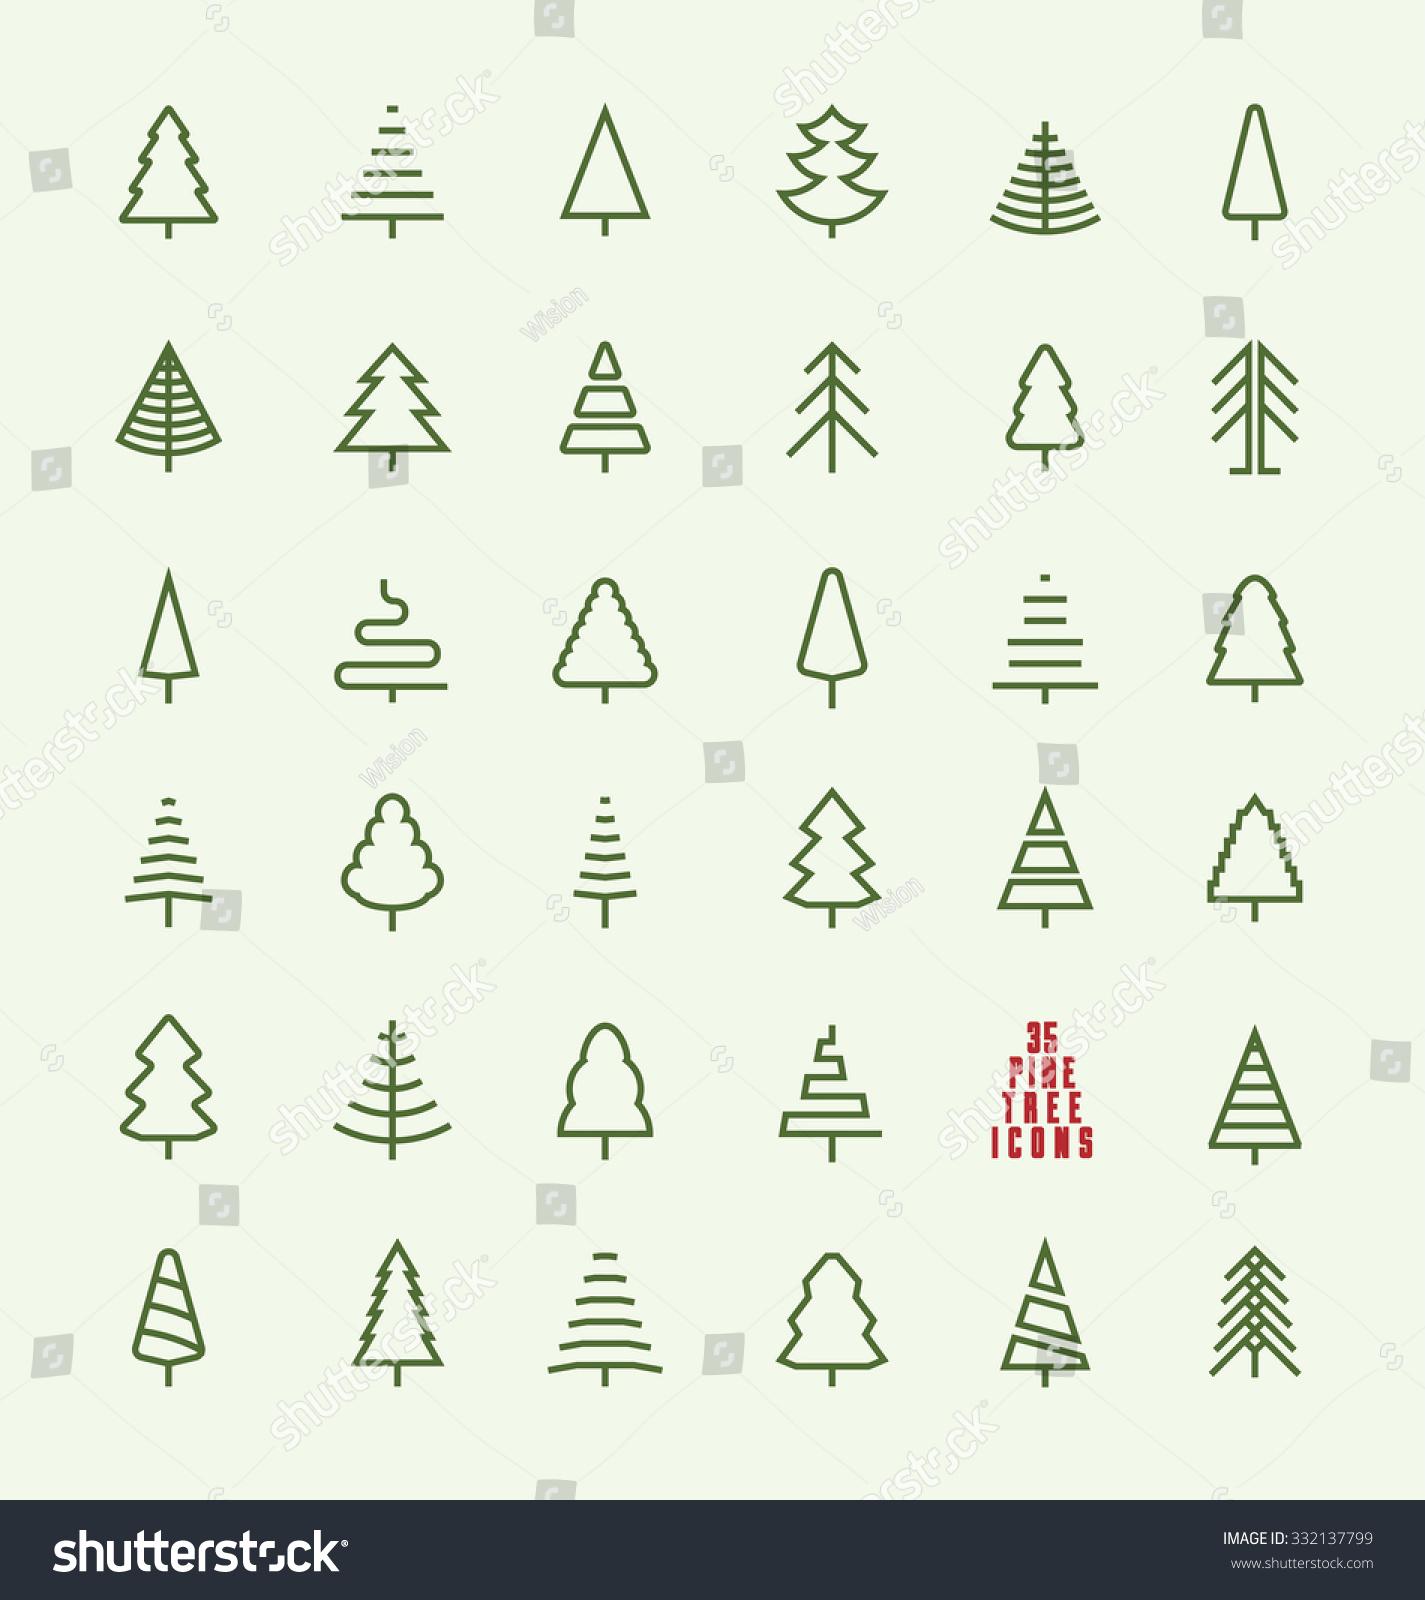 Tree Line Art Design : Thin line pine tree icon set stock vector